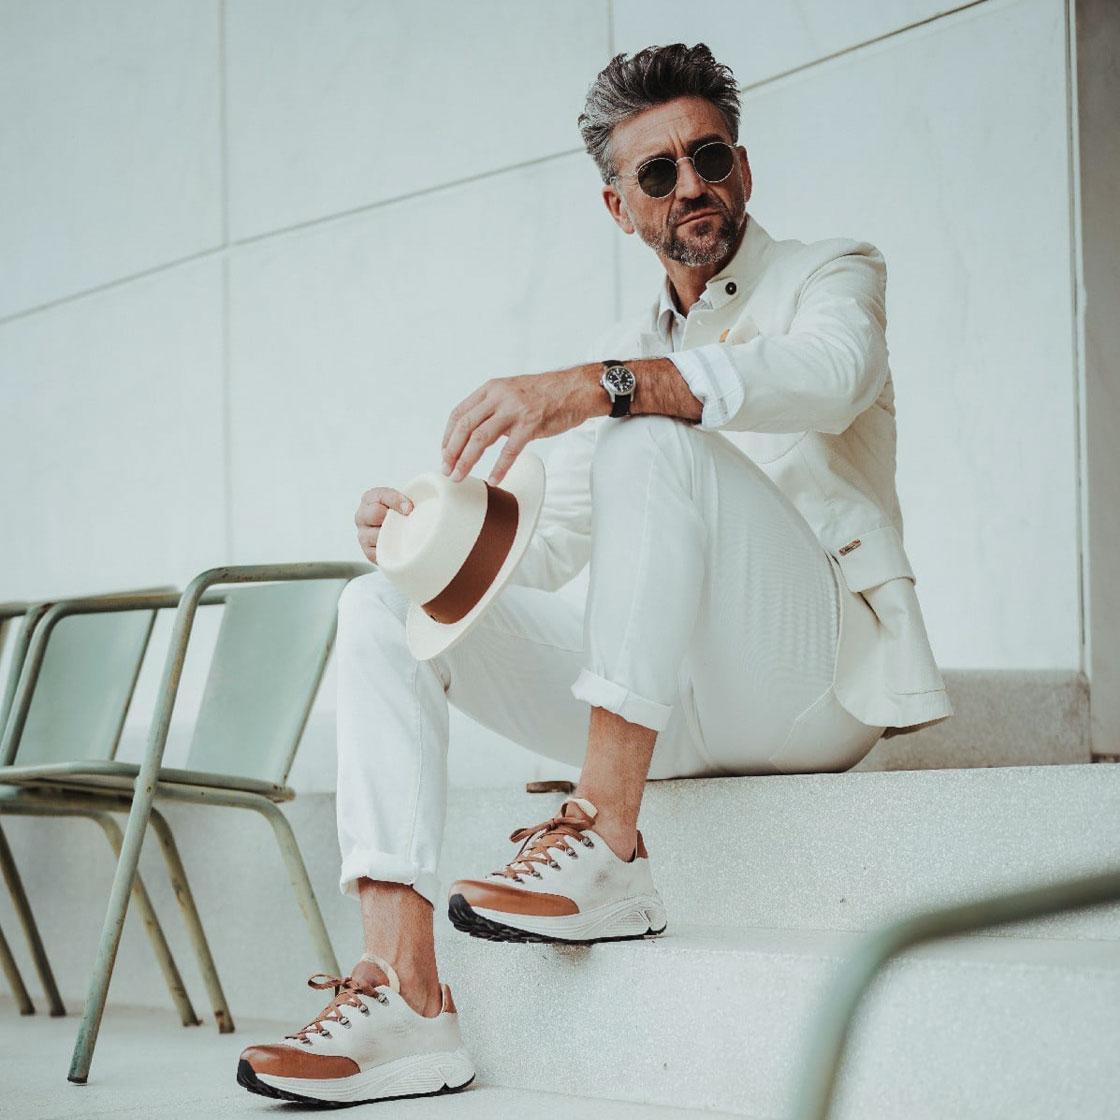 Luxusná móda pre gentlemanov - Luis Trenker